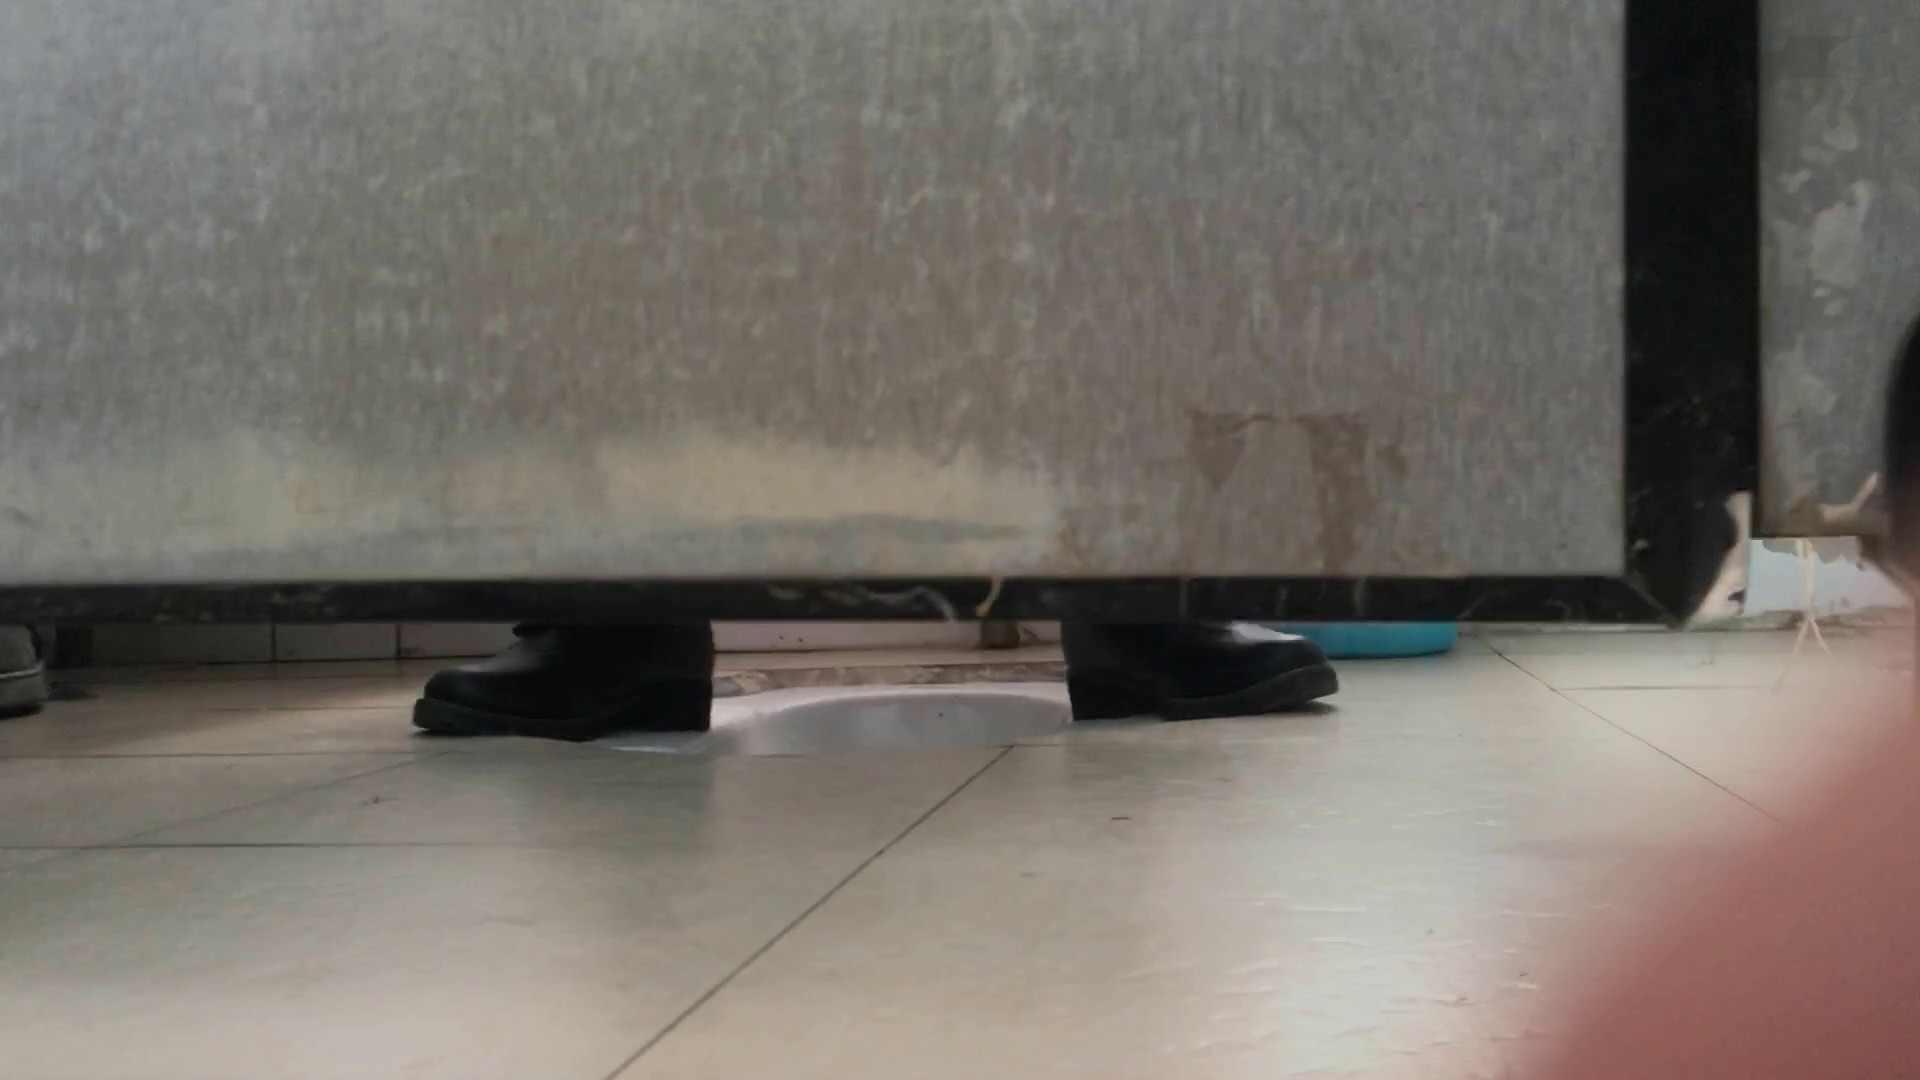 芸術大学ガチ潜入盗撮 JD盗撮 美女の洗面所の秘密 Vol.80 盛合せ  79PIX 40